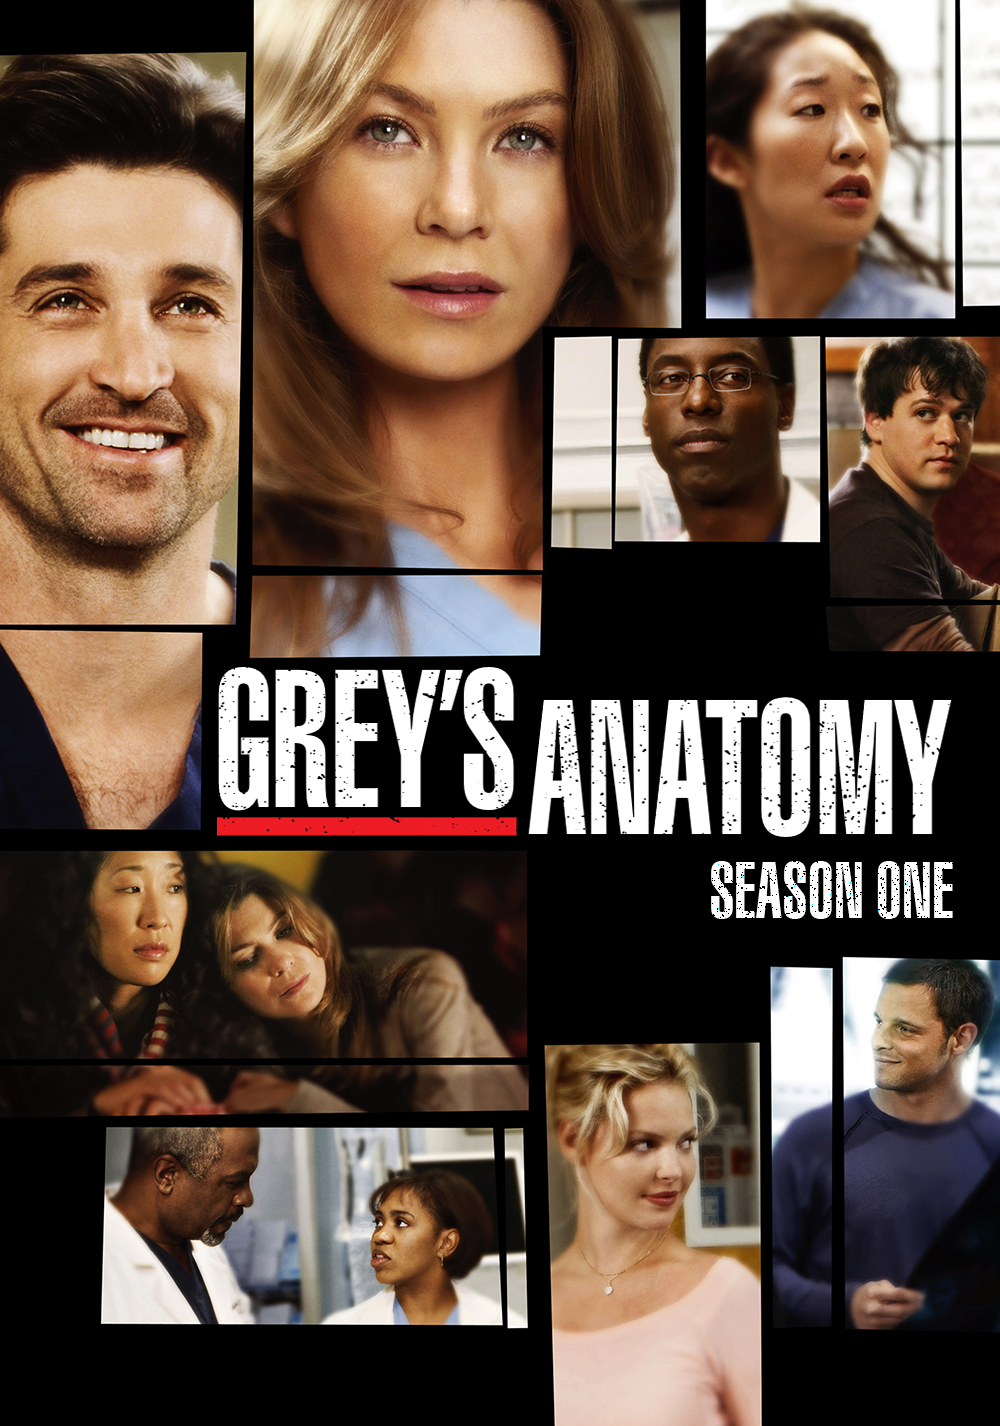 Greys anatomy series 7